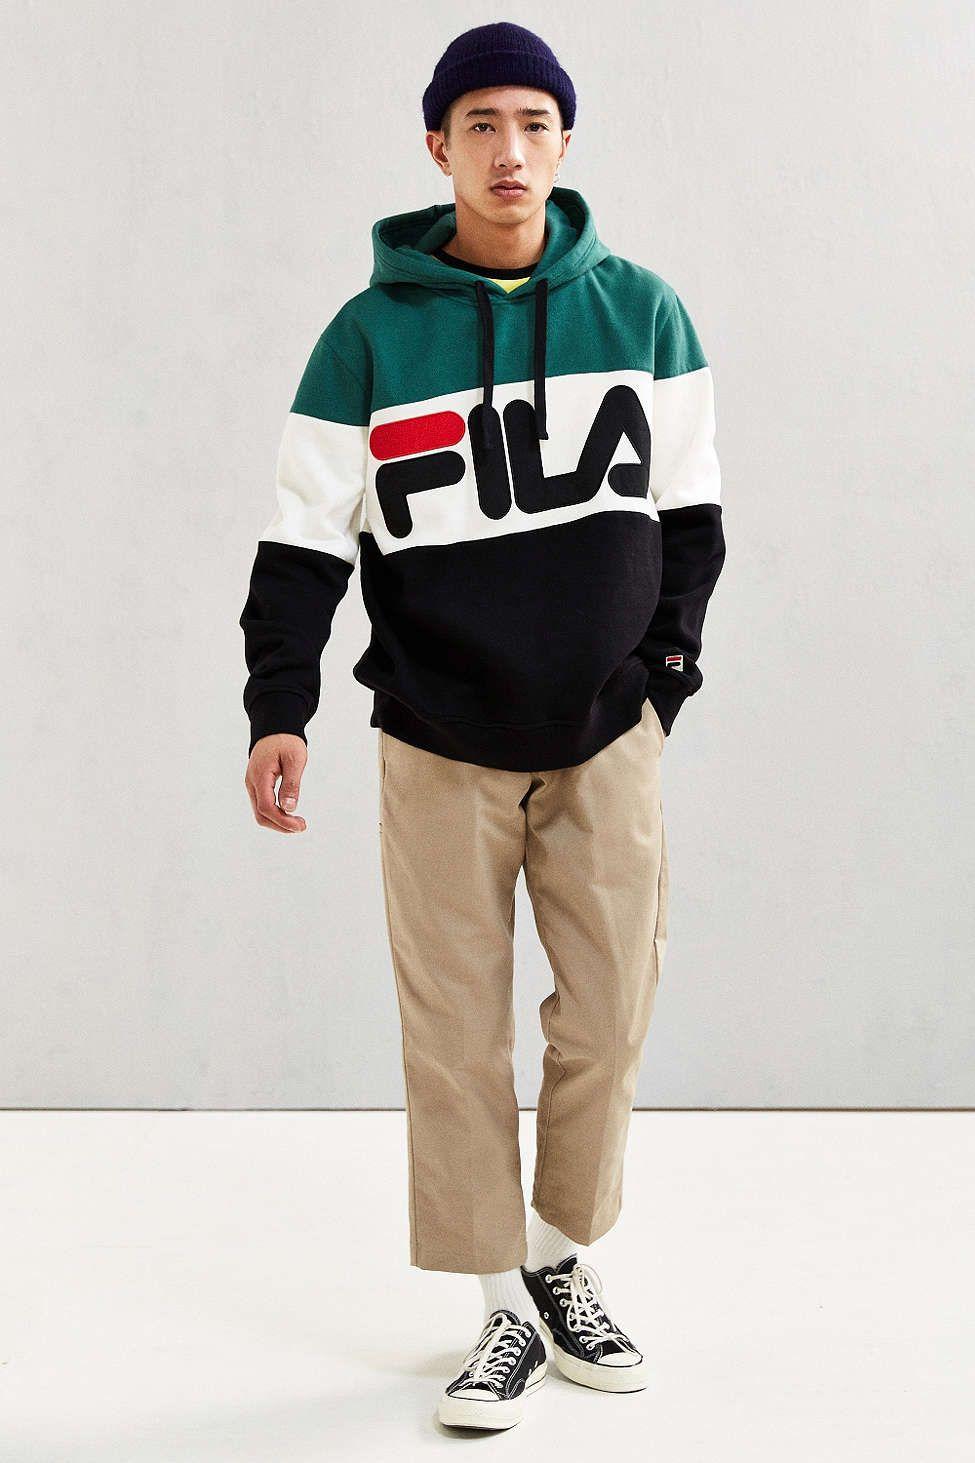 d0e3aee08aed FILA Colorblocked Hoodie Sweatshirt | New Arrivals | Fashion, Mens ...